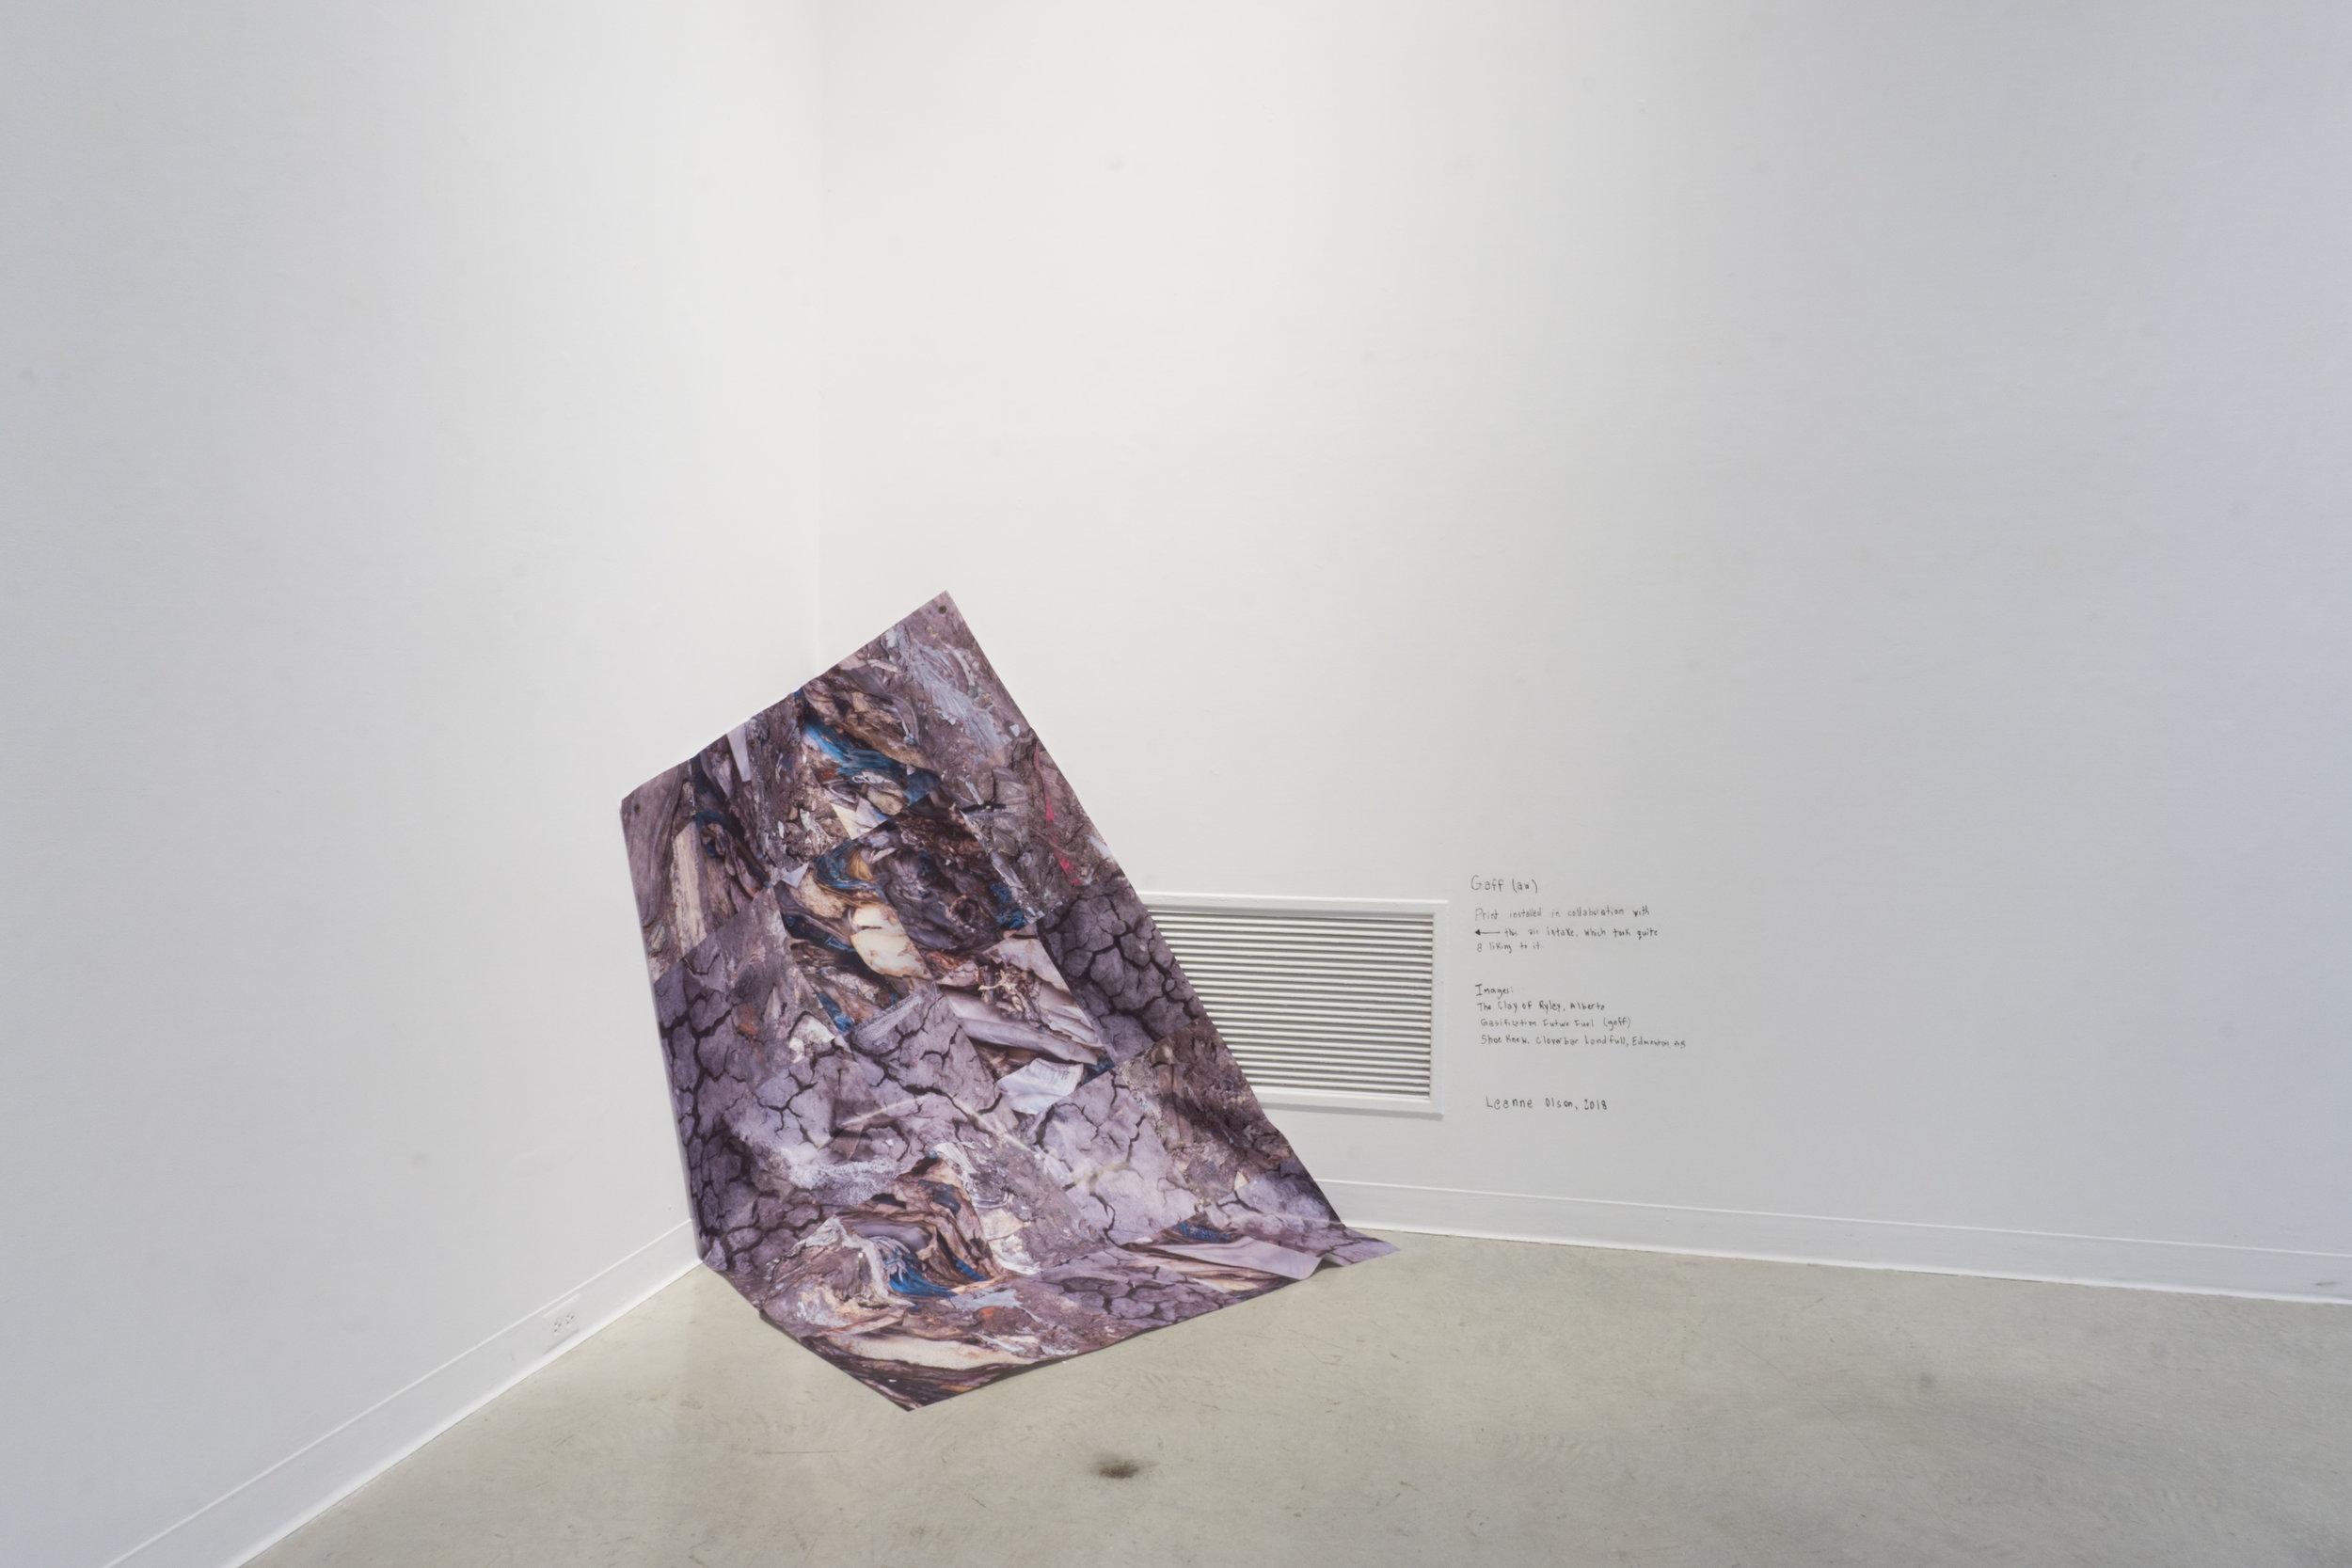 work by Leanne Olson